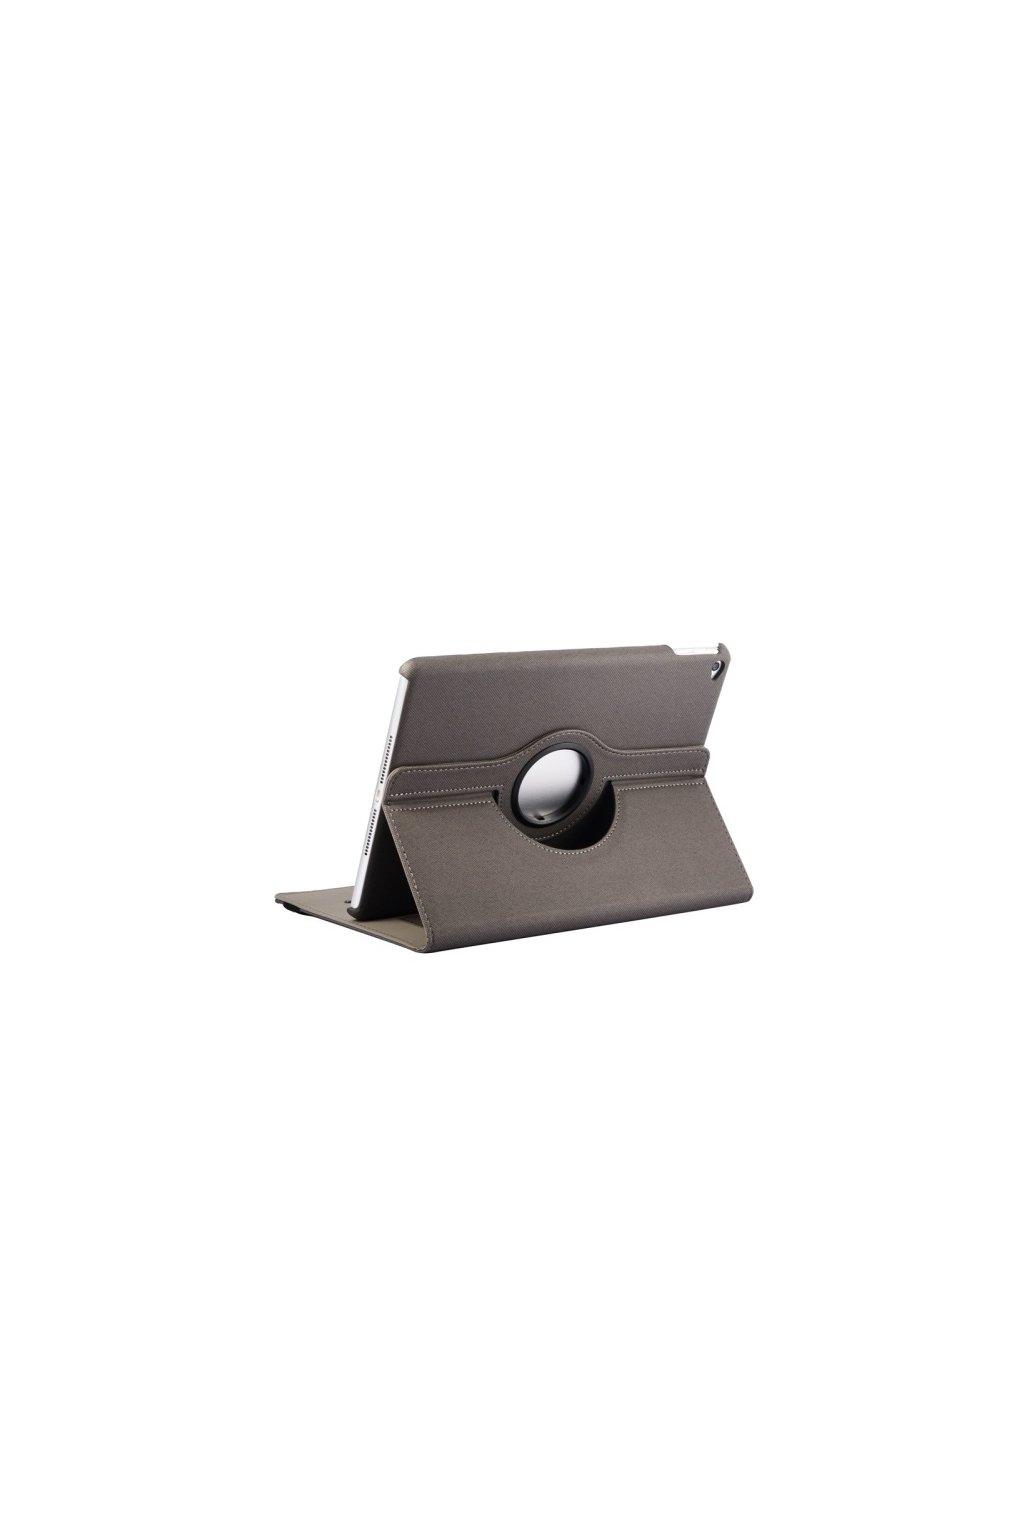 Pouzdro Denim iPad Air 2, grey/šedá